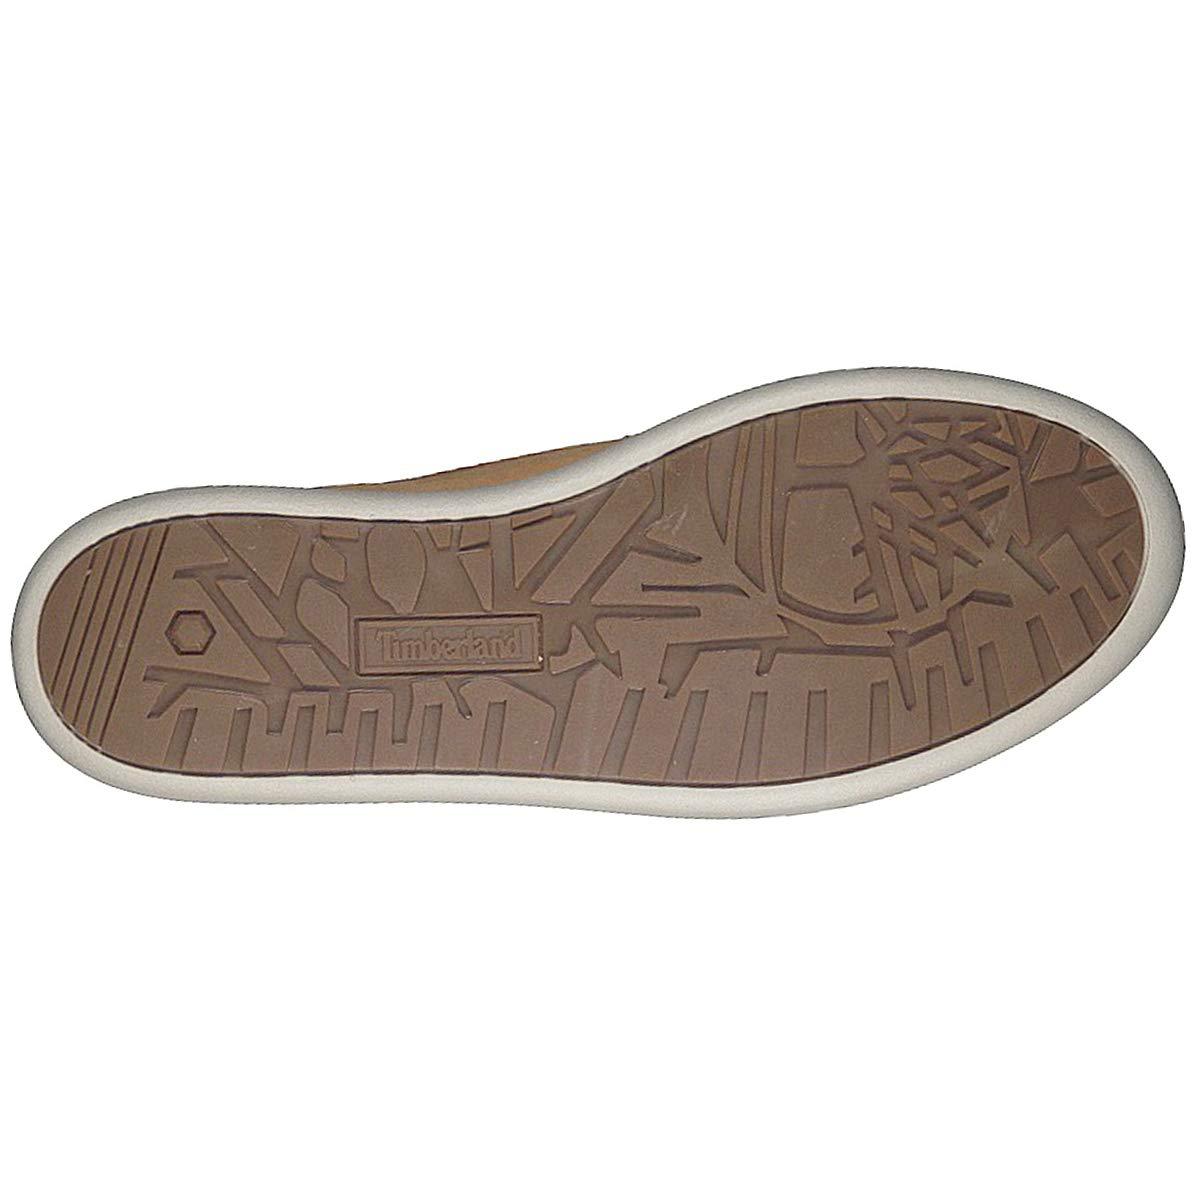 Timberland TB0A1RXQ7631 Berlin Park 6 Inch Damen Stiefel aus aus aus Nubukleder Textil  18f21c